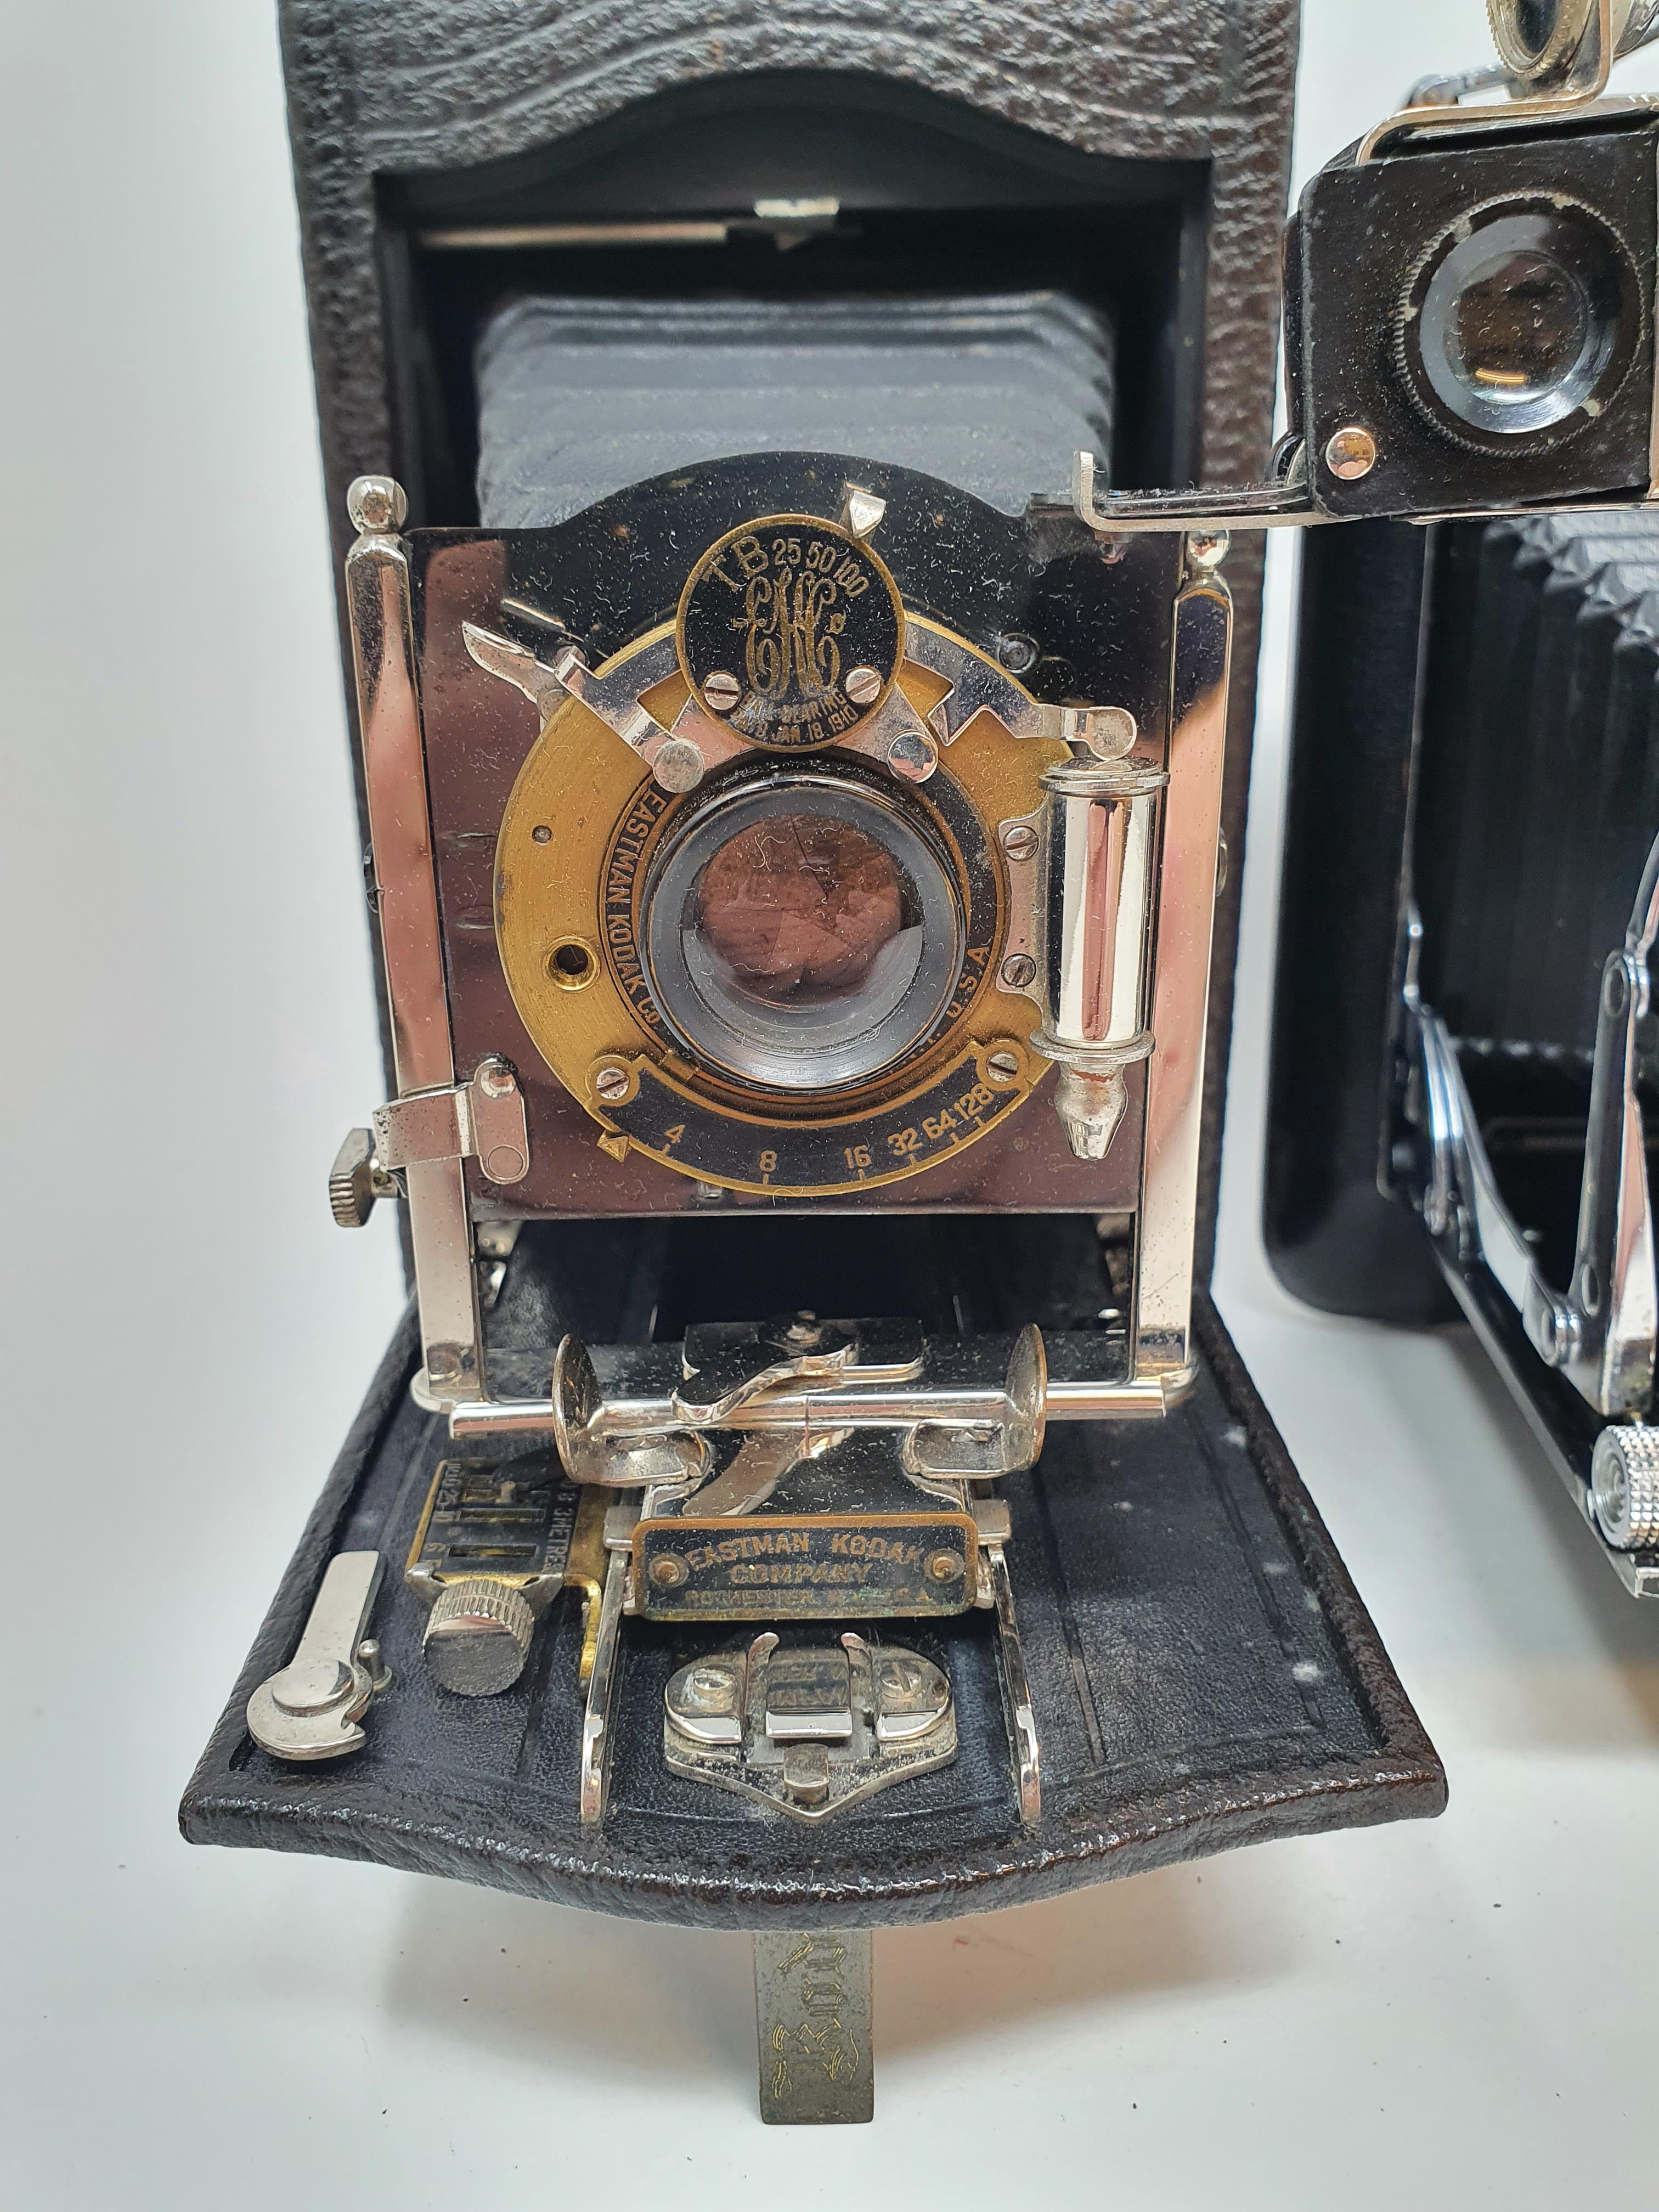 A Kodak Regent folding camera, with leather outer case, a Kodak folding camera, with leather outer - Image 2 of 6